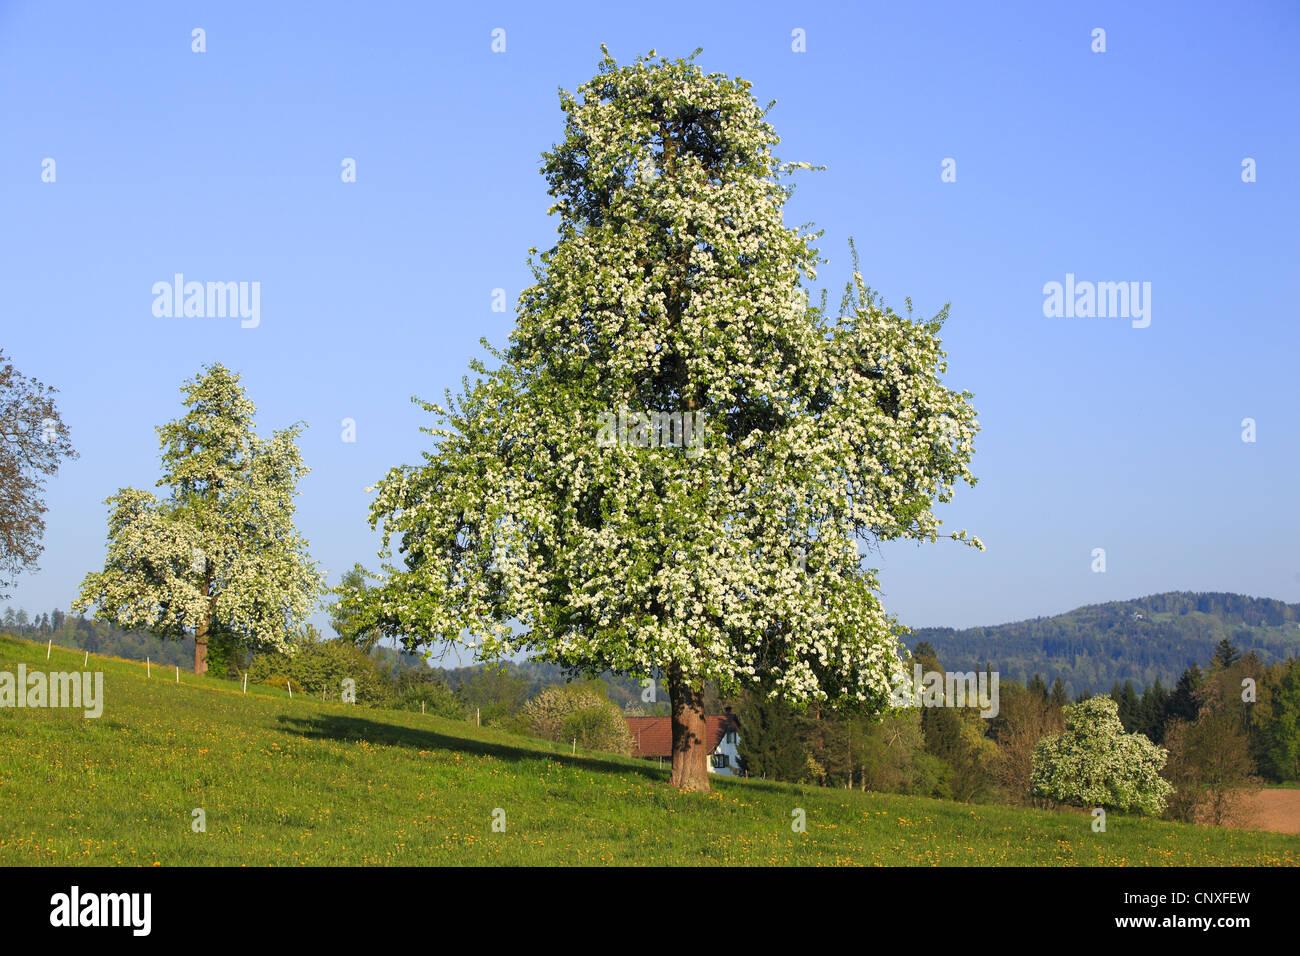 Tree Pyrus Communis Related Keywords - Tree Pyrus Communis ...